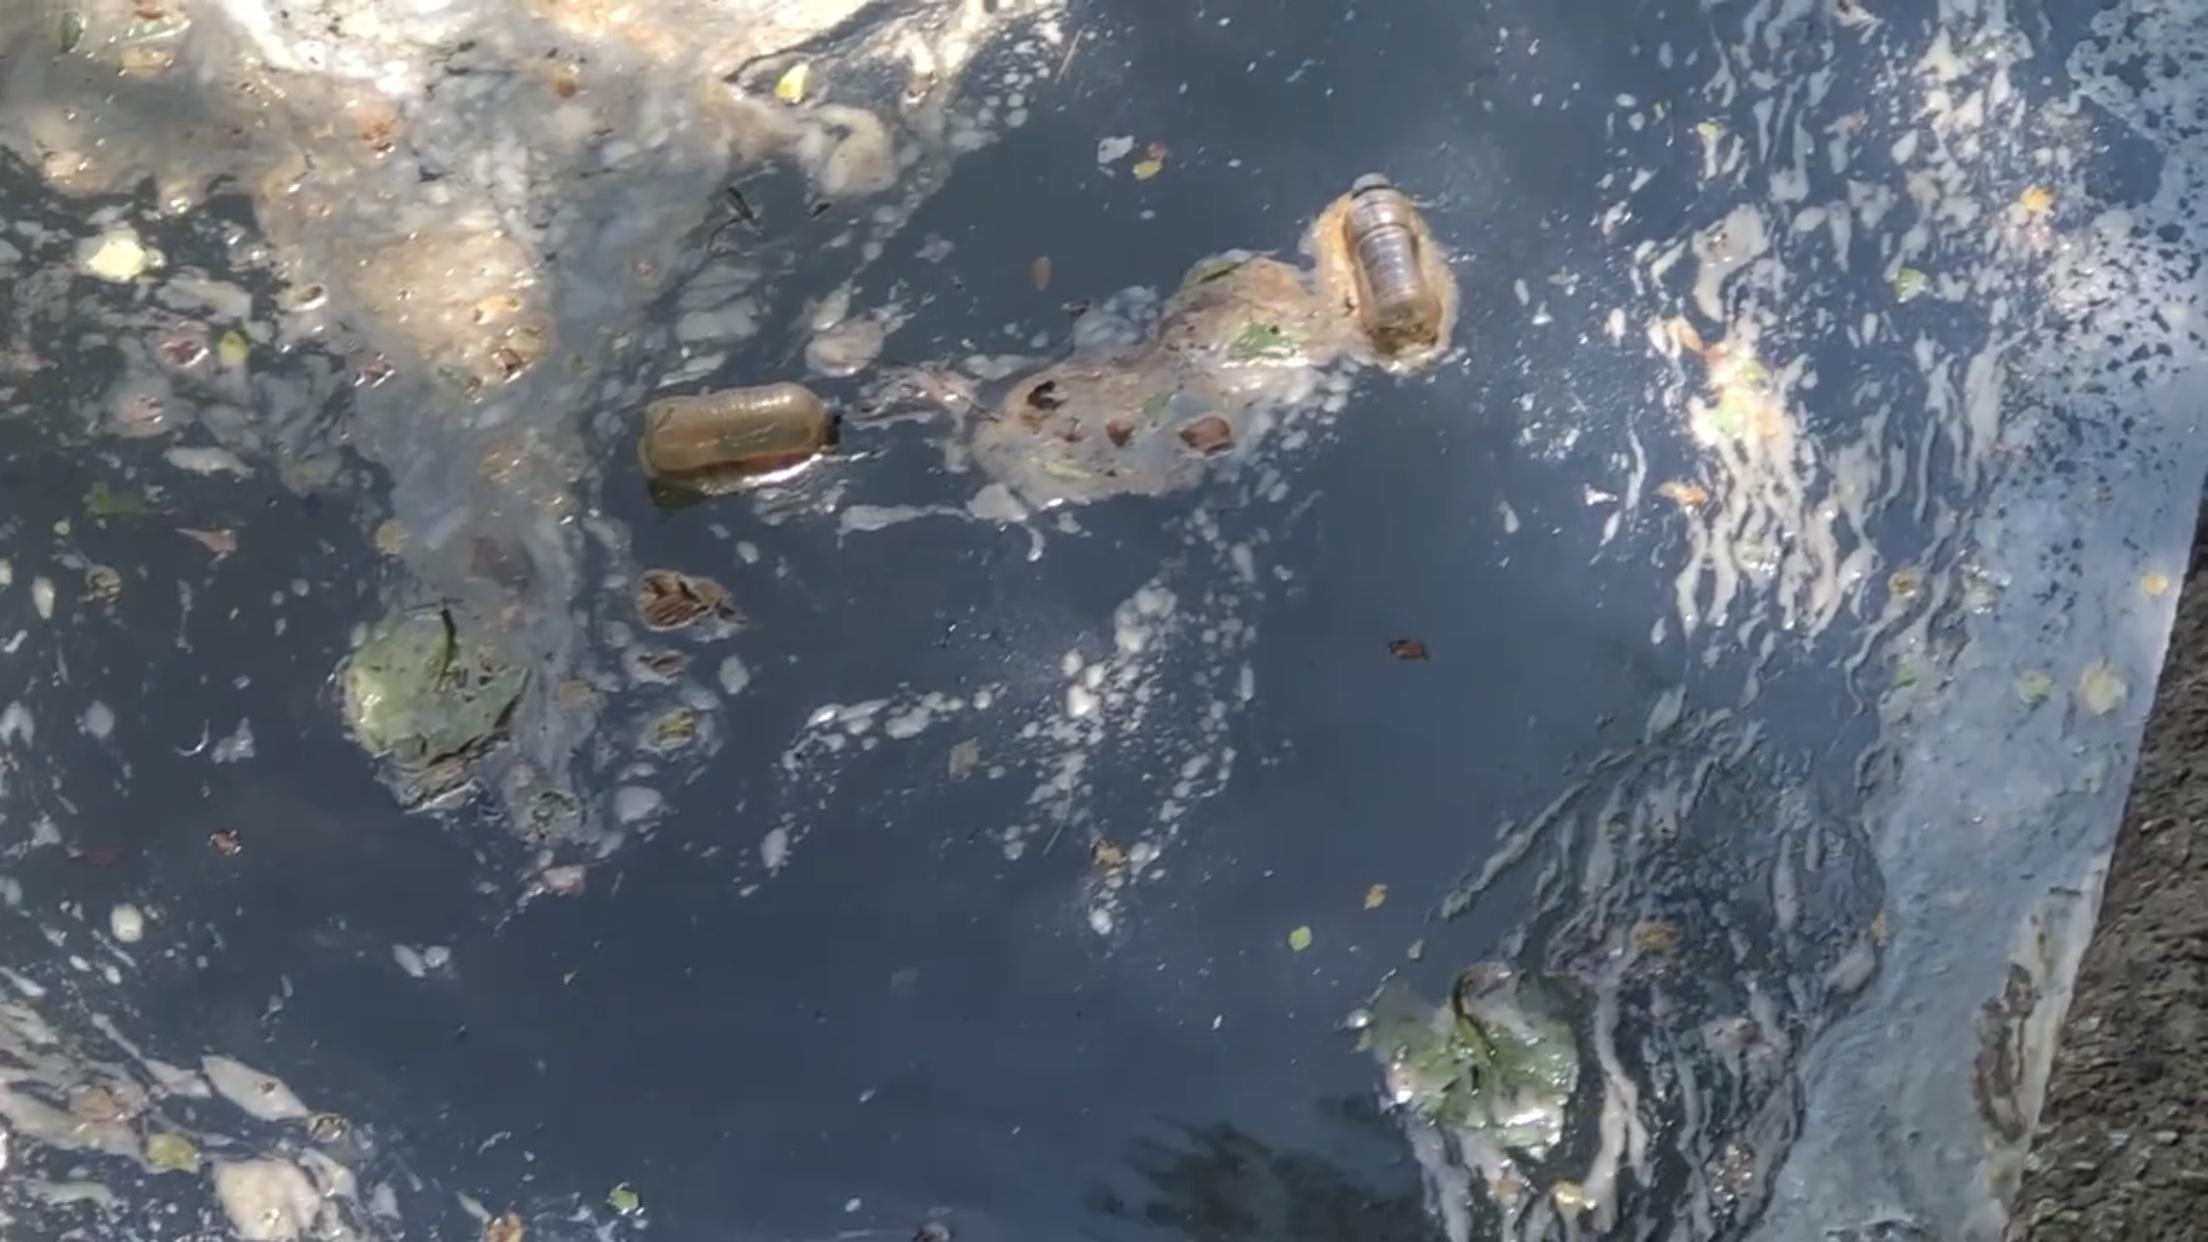 Litter in Cahaba River